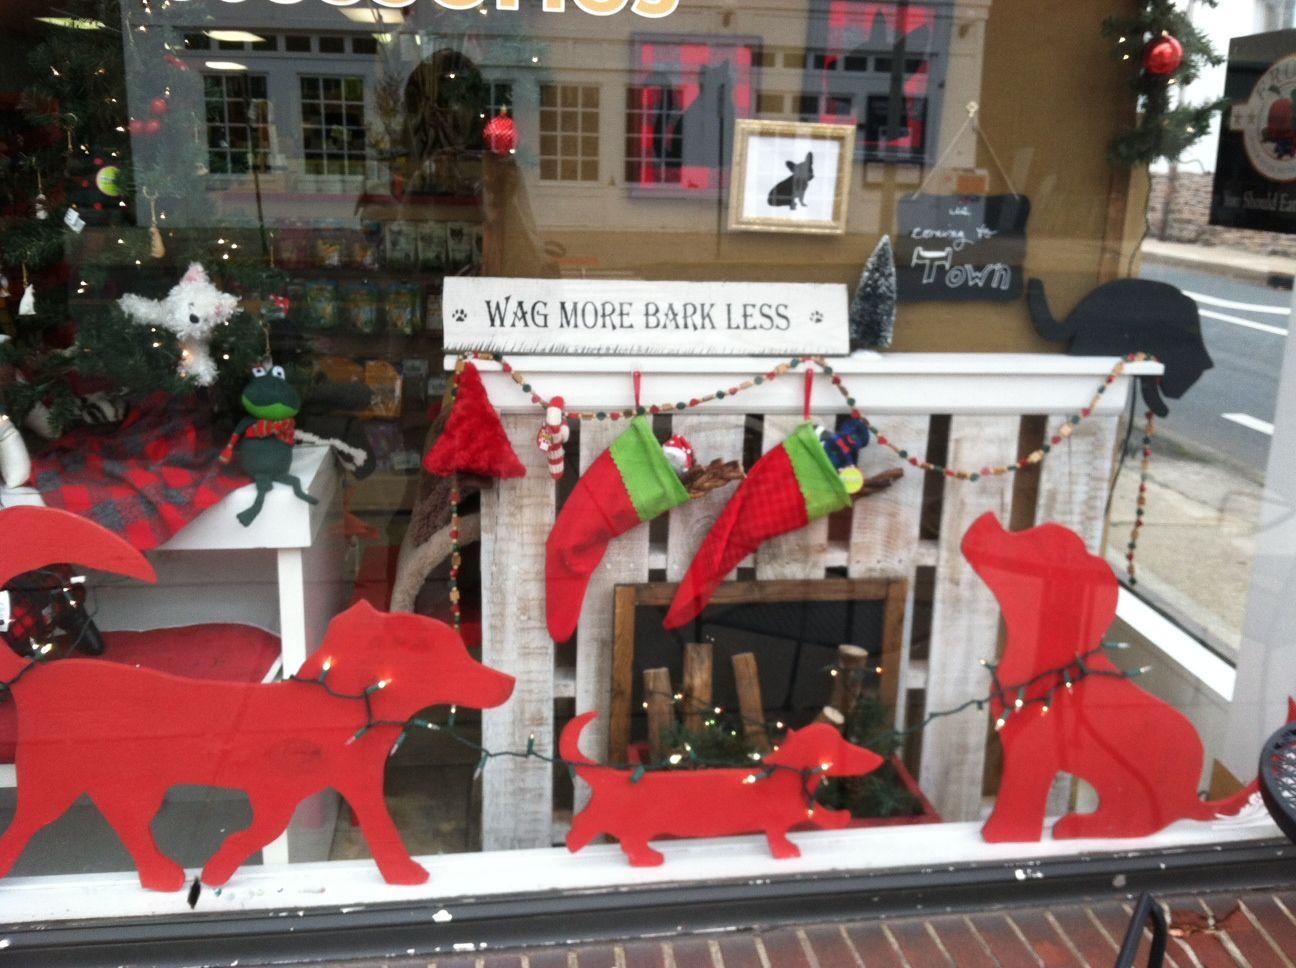 Pet Store Window Pet Store Display Christmas Shop Window Christmas Window Display